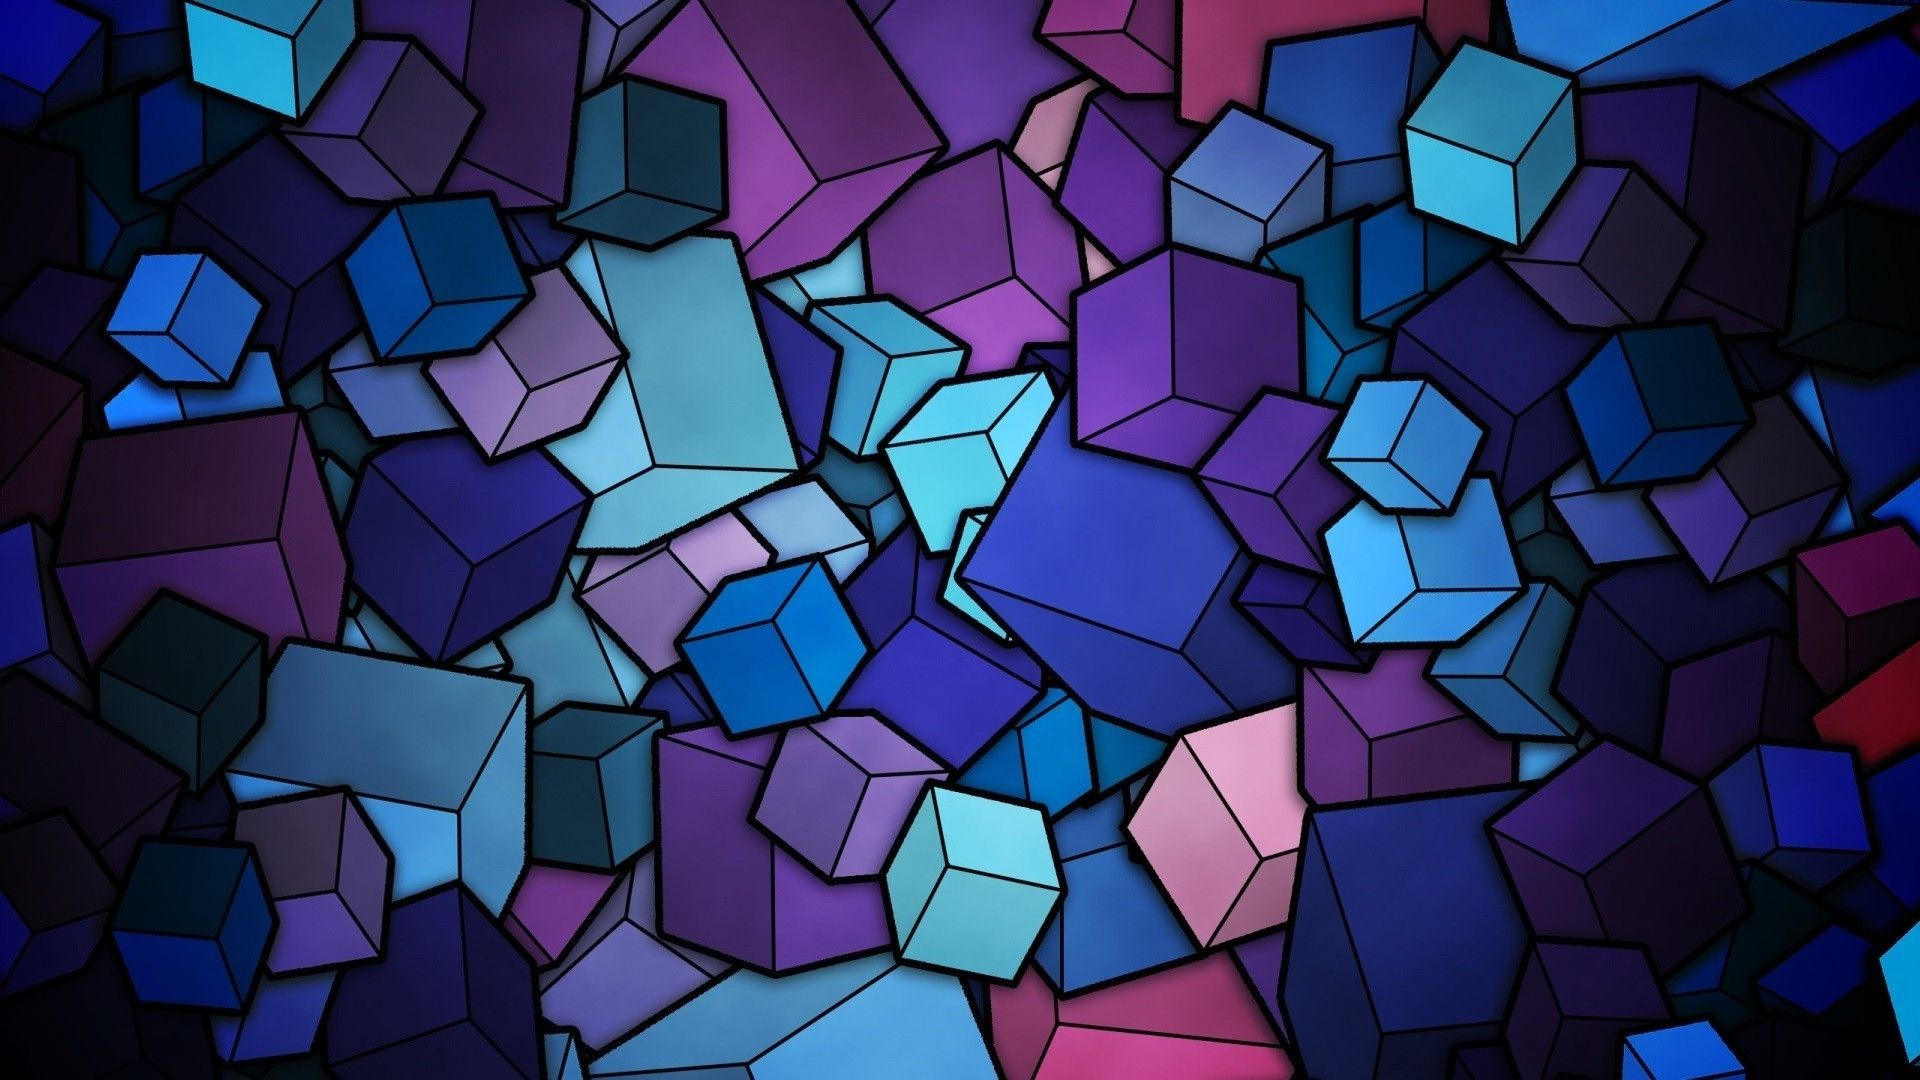 3d Cubes Vector Wallpapers Geometric Wallpaper Iphone Geometric Iphone Abstract Wallpaper